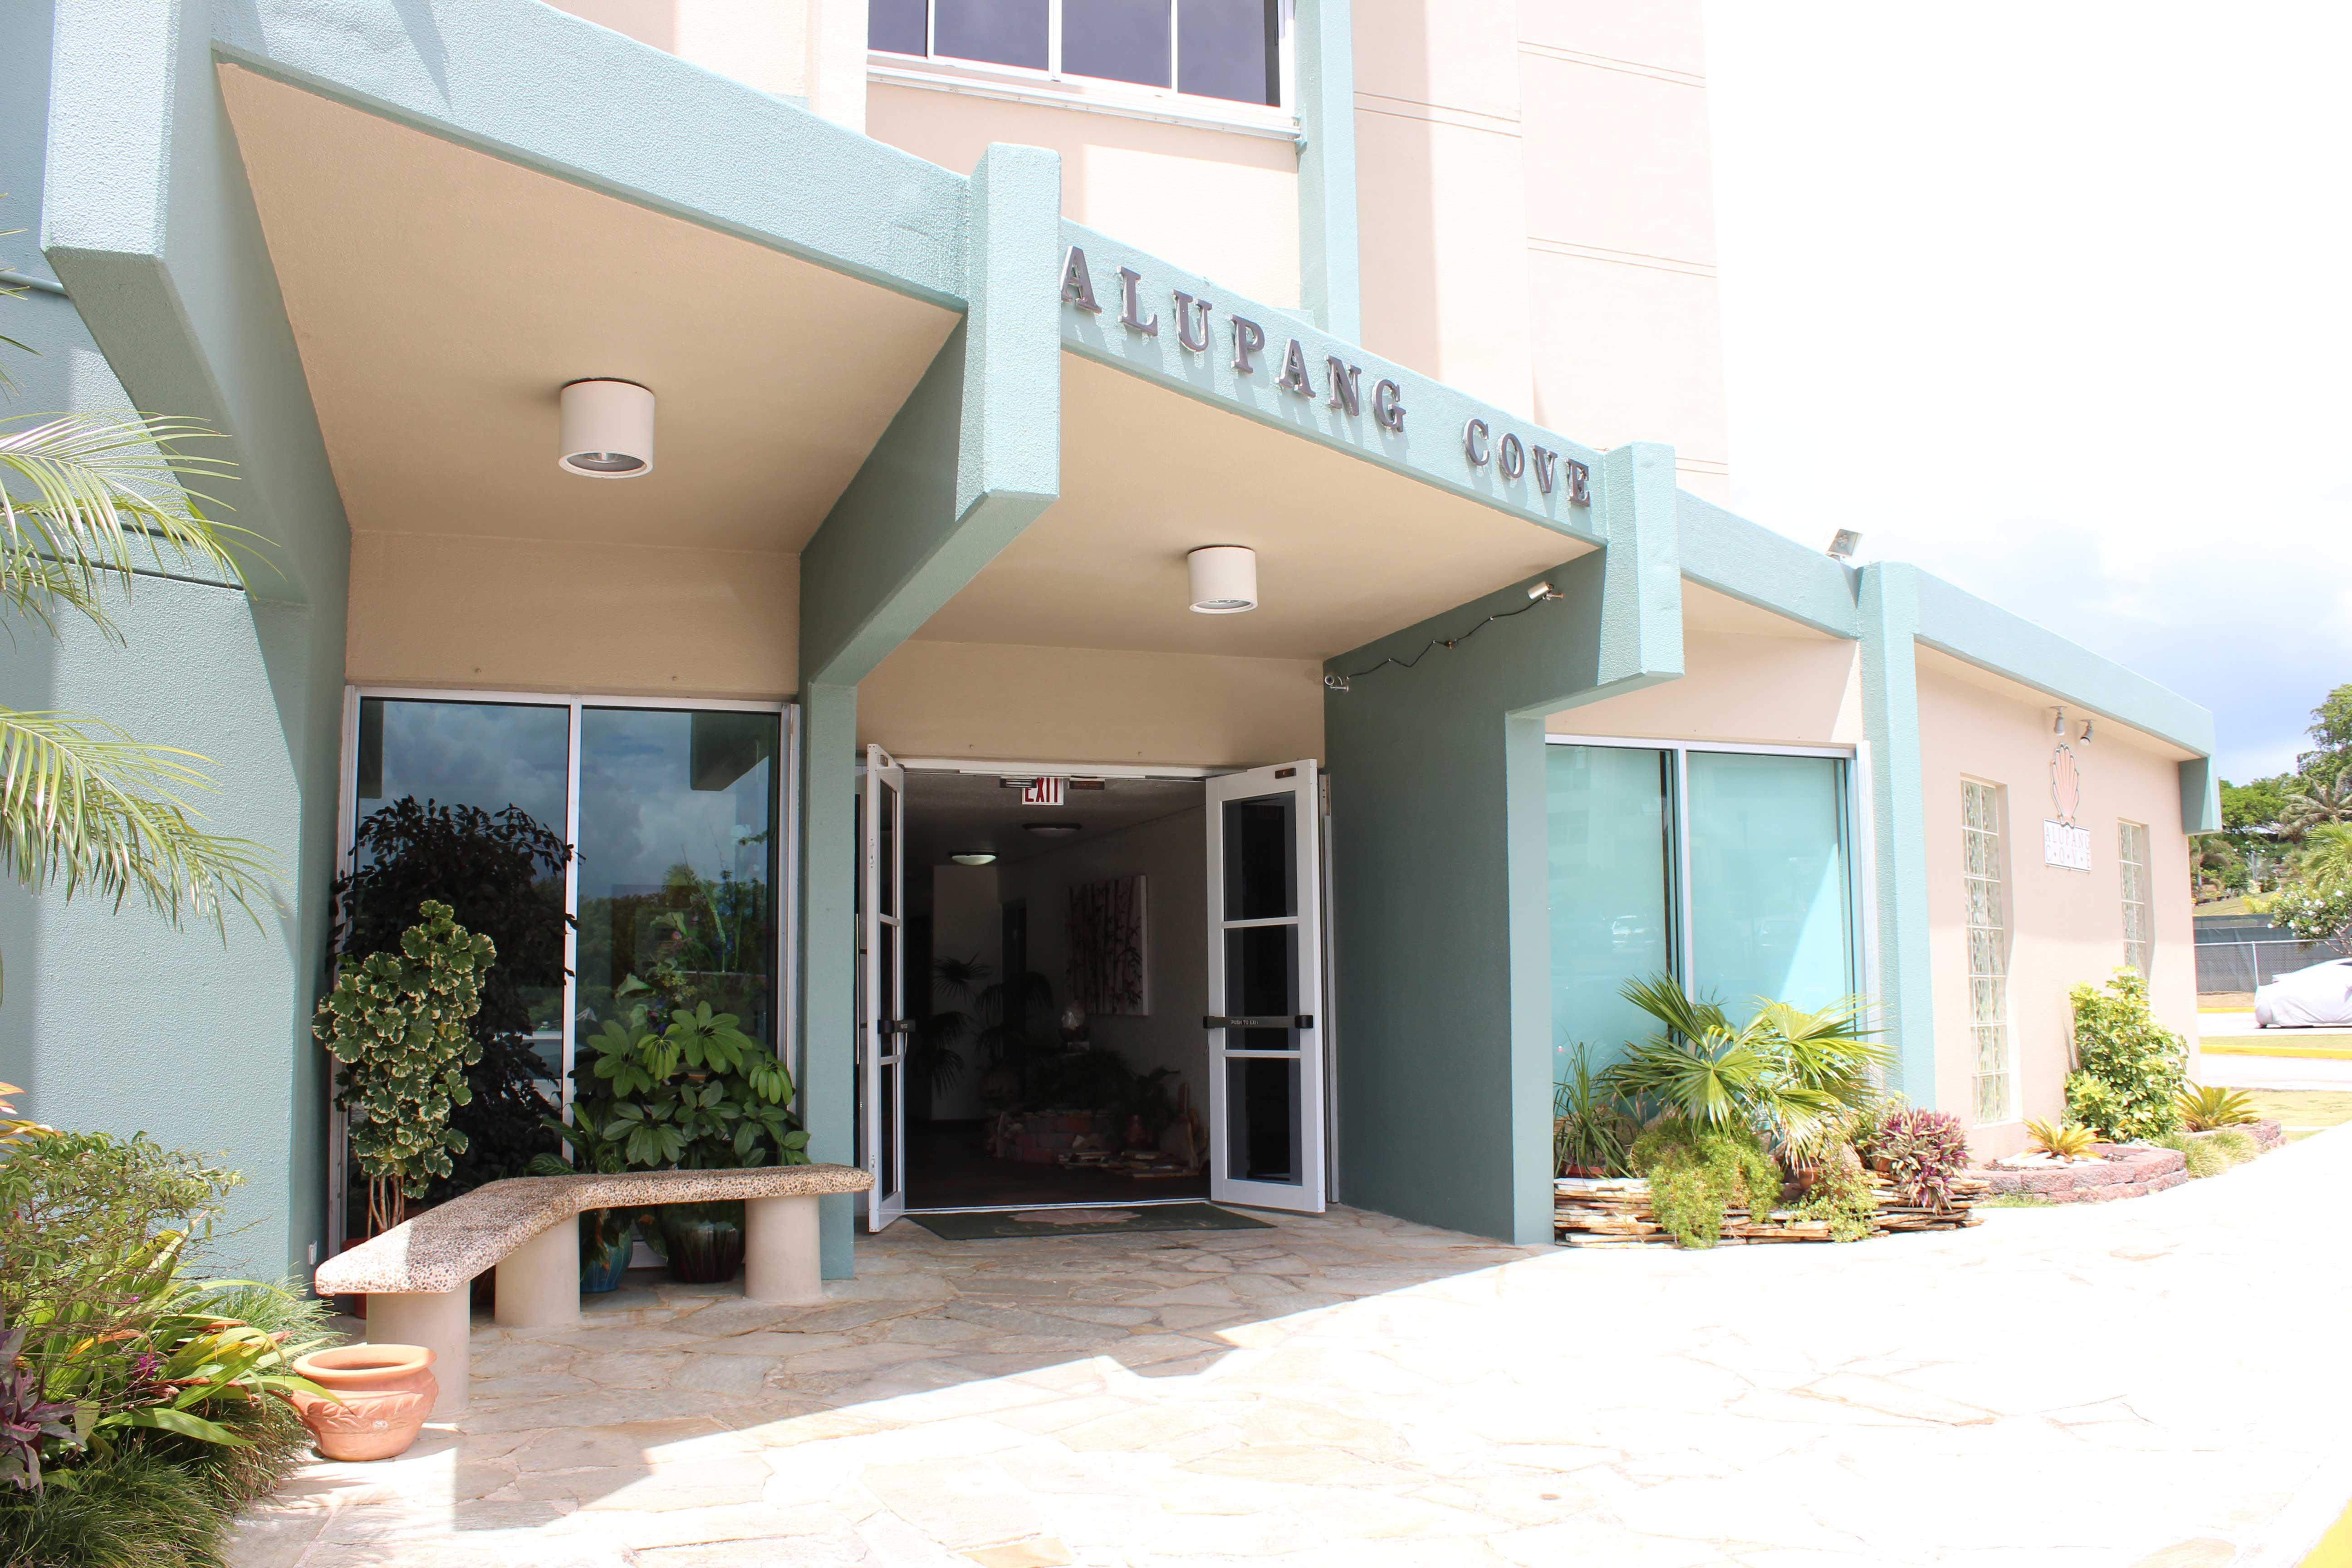 Alupang-Cove-Condo-Guam-Entrance